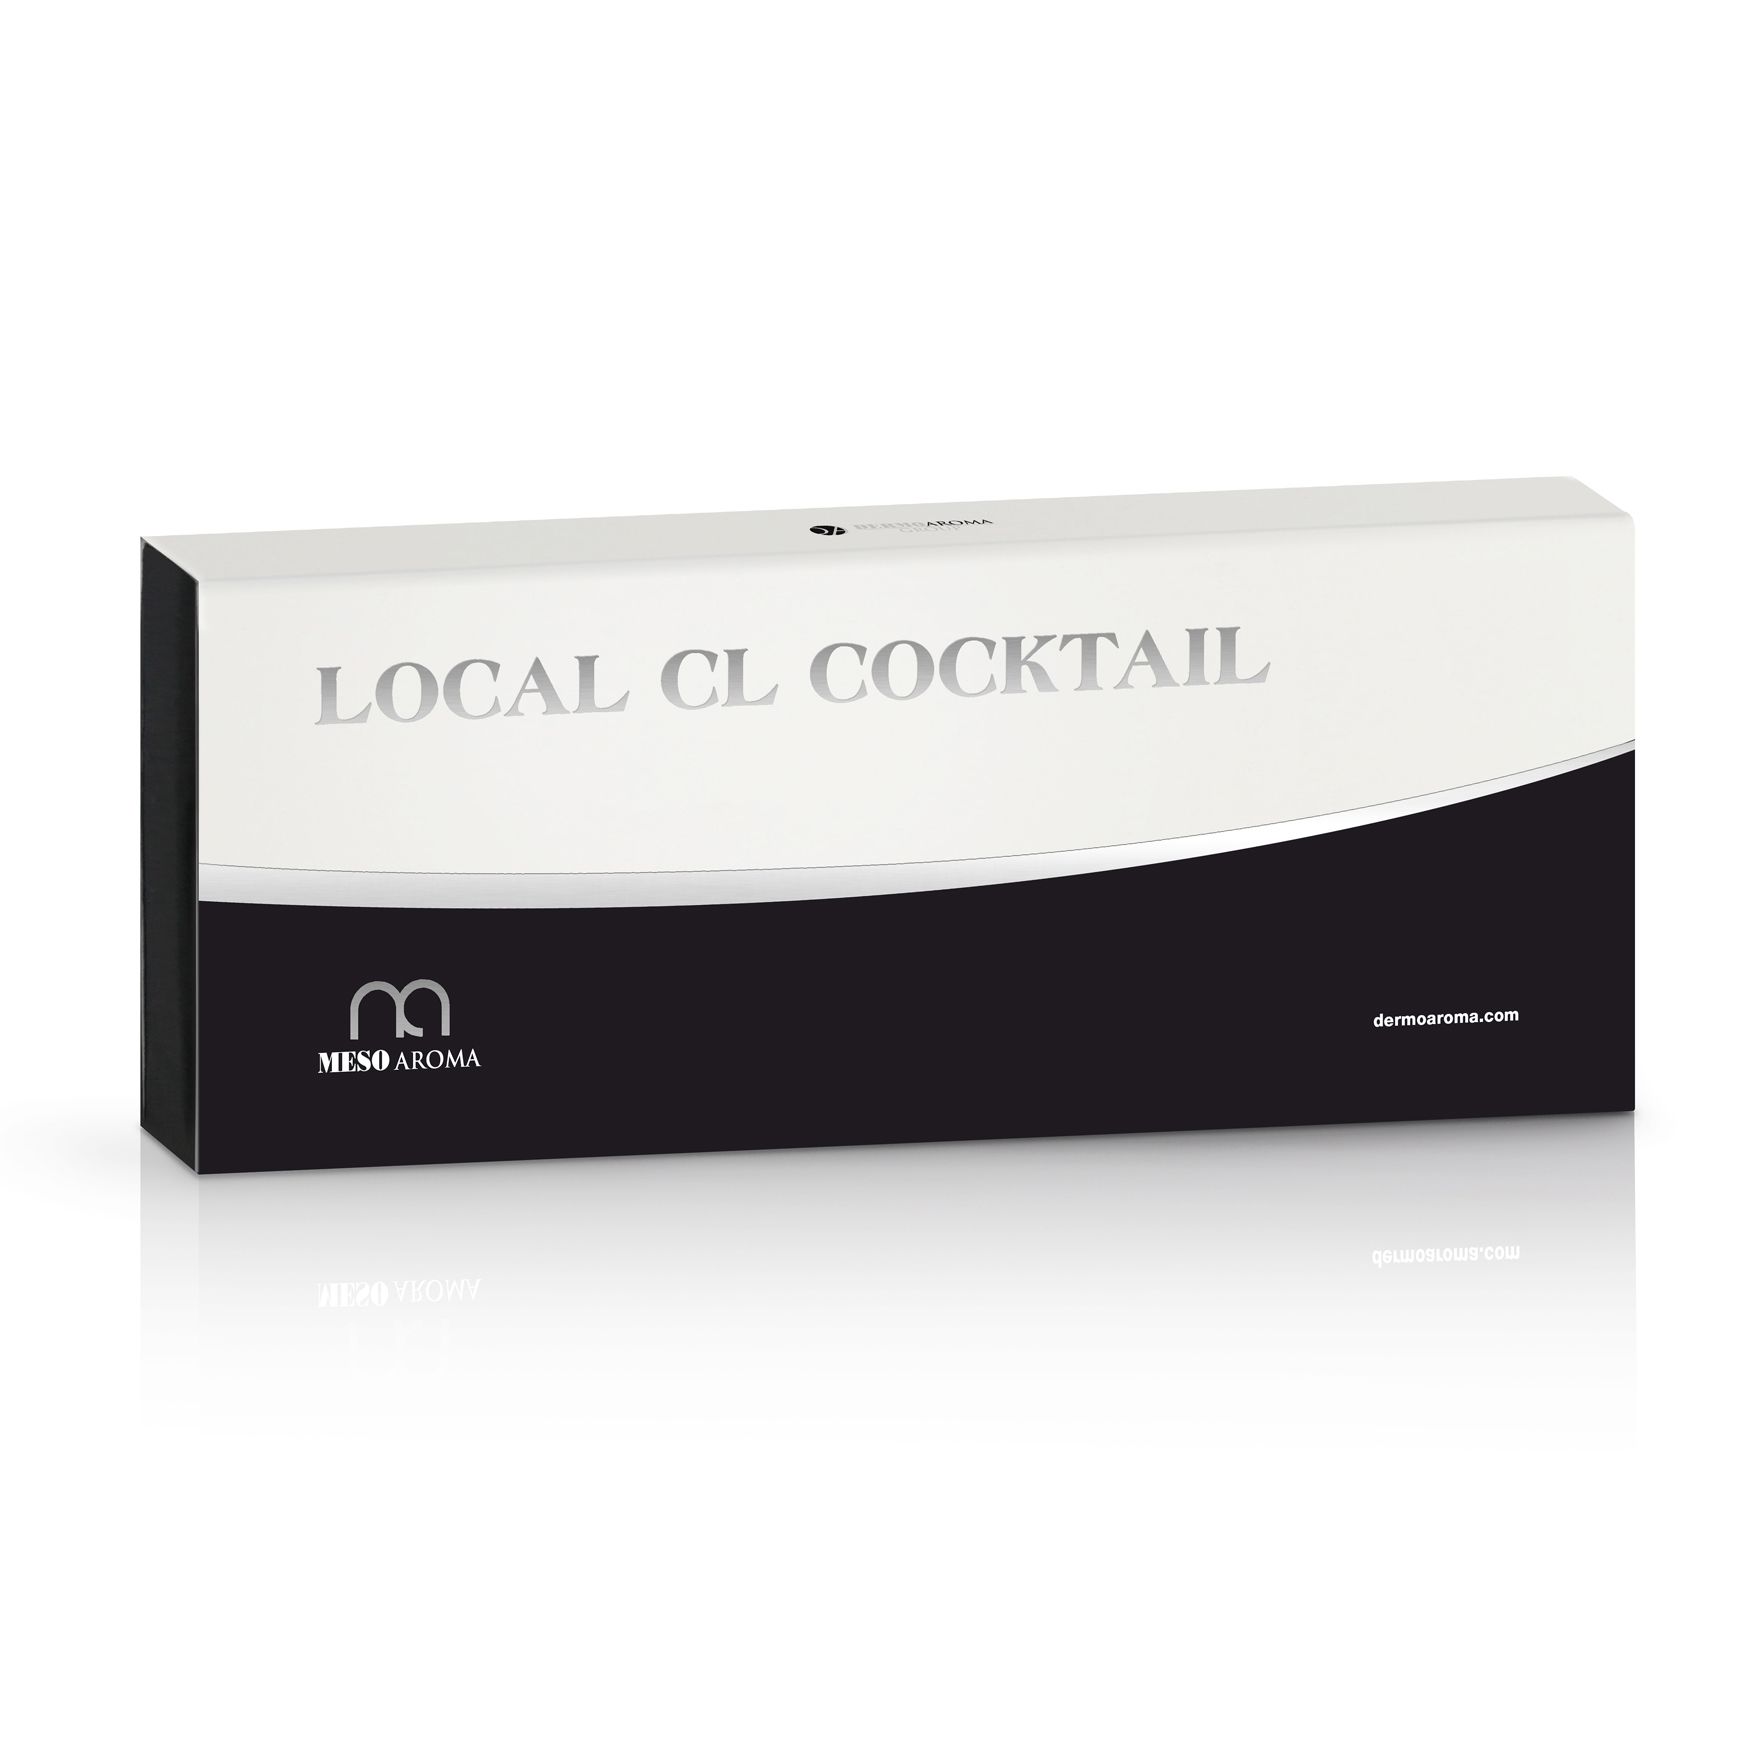 Mesoaroma-ampułki-do-mezoterapii-LOCAL-CL-COCKTAIL